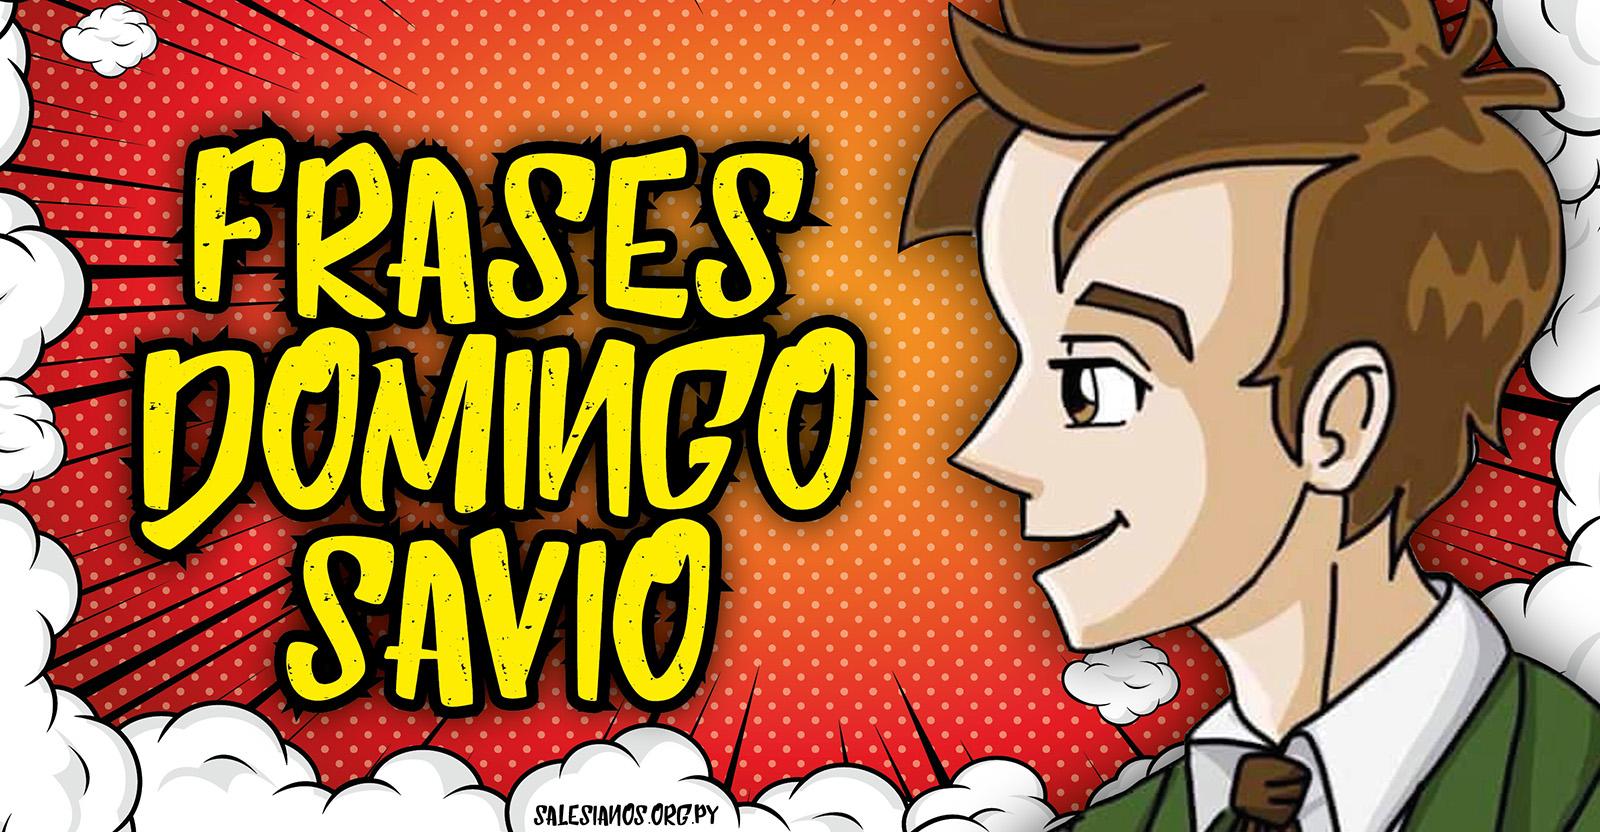 Imagens E Frases De Domingo: Elige La Mejor Frase De Domingo Savio